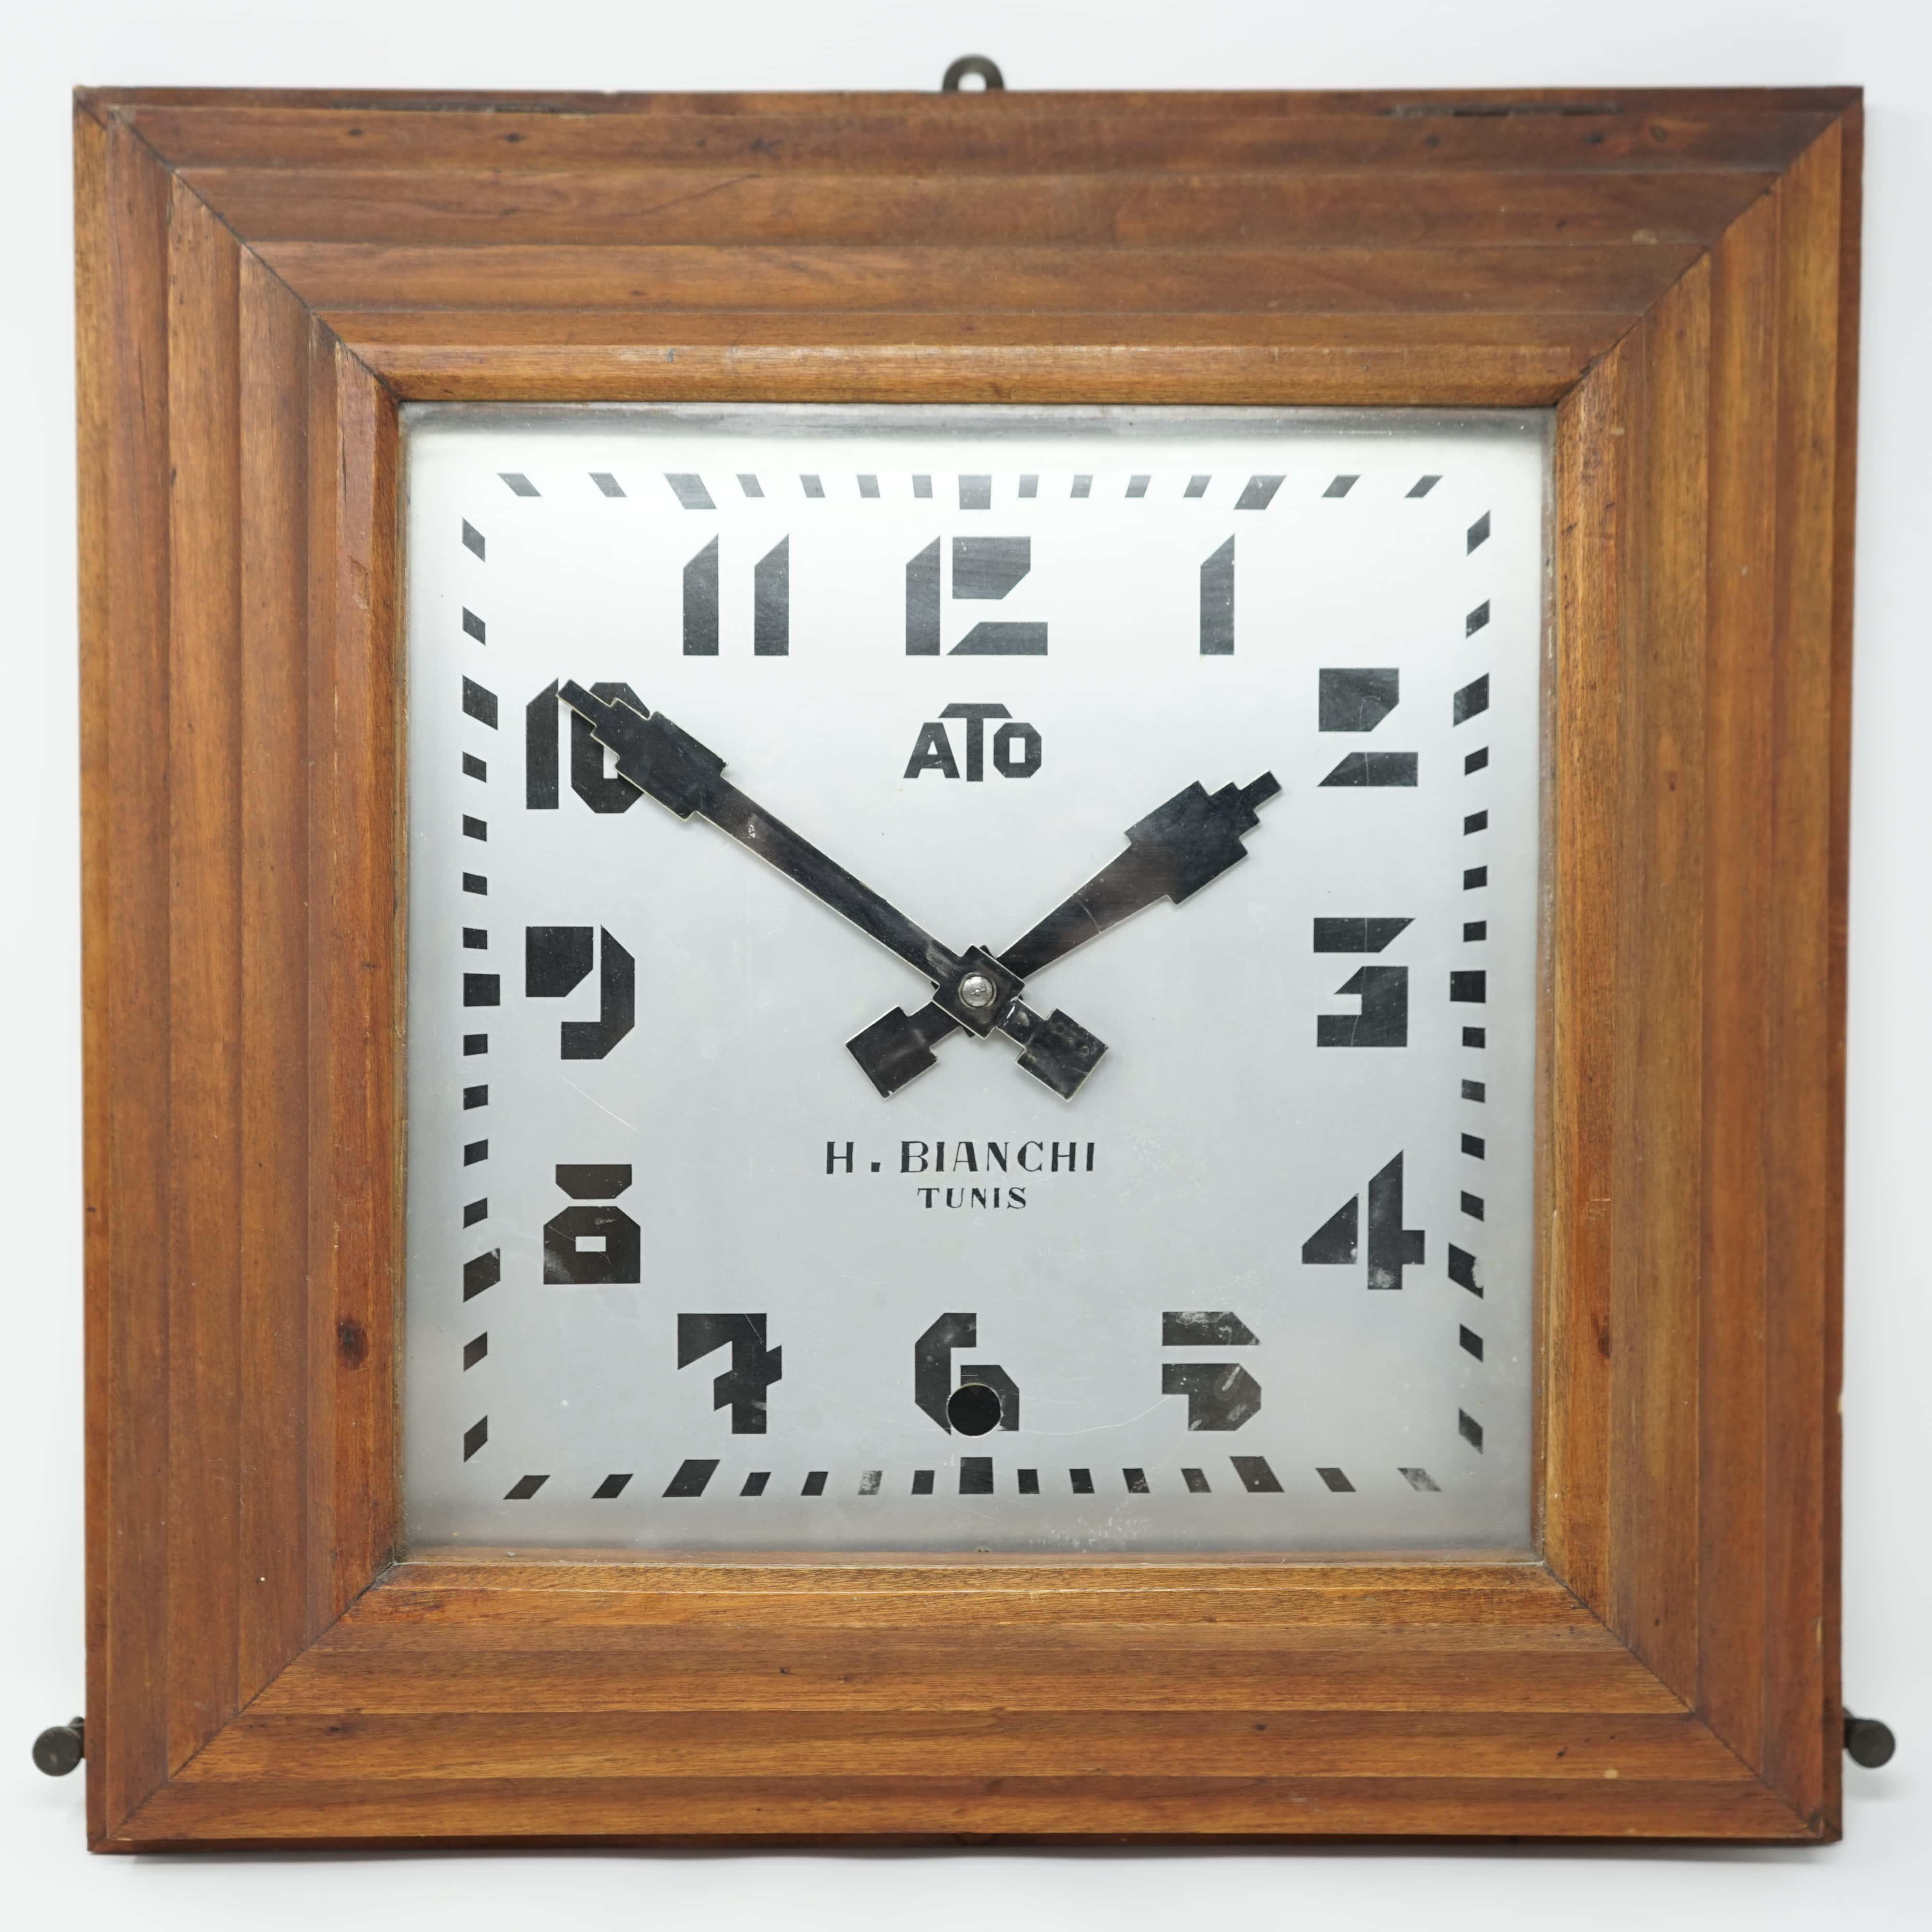 Horloge ATO Ancienne H. Bianchi à Tunis